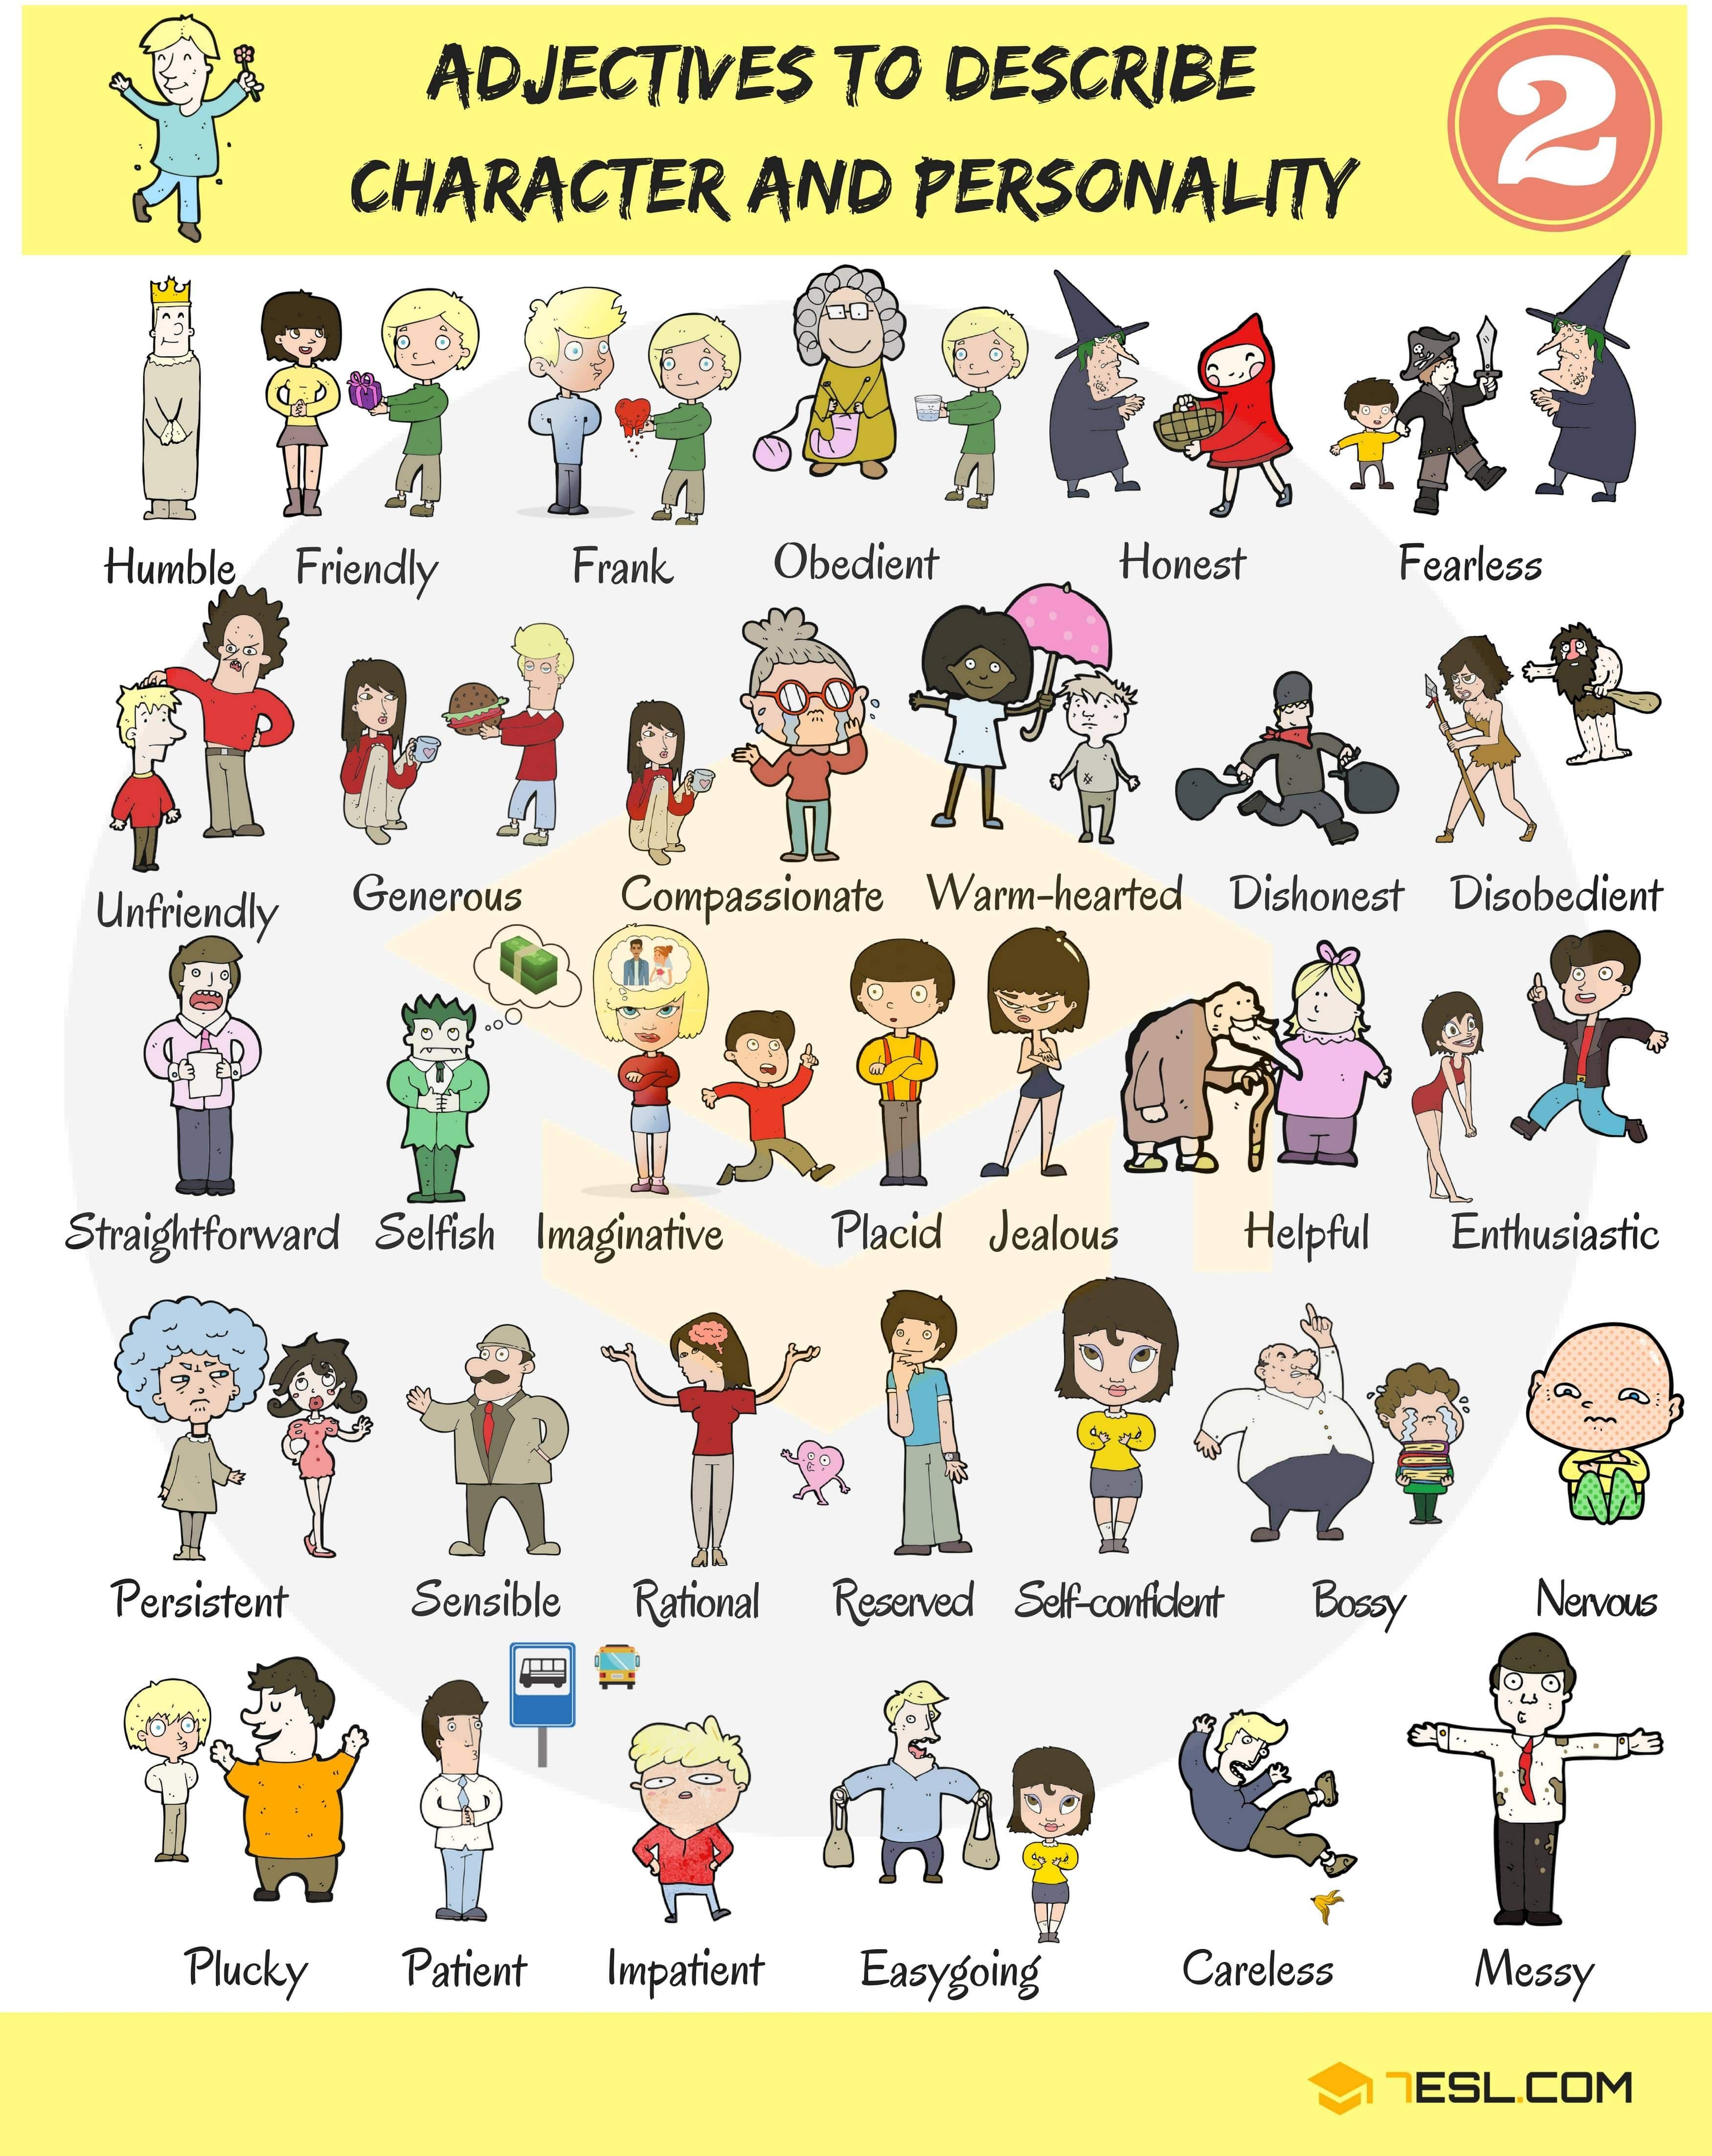 100 Personality Adjectives Adjetivos De Personalidade